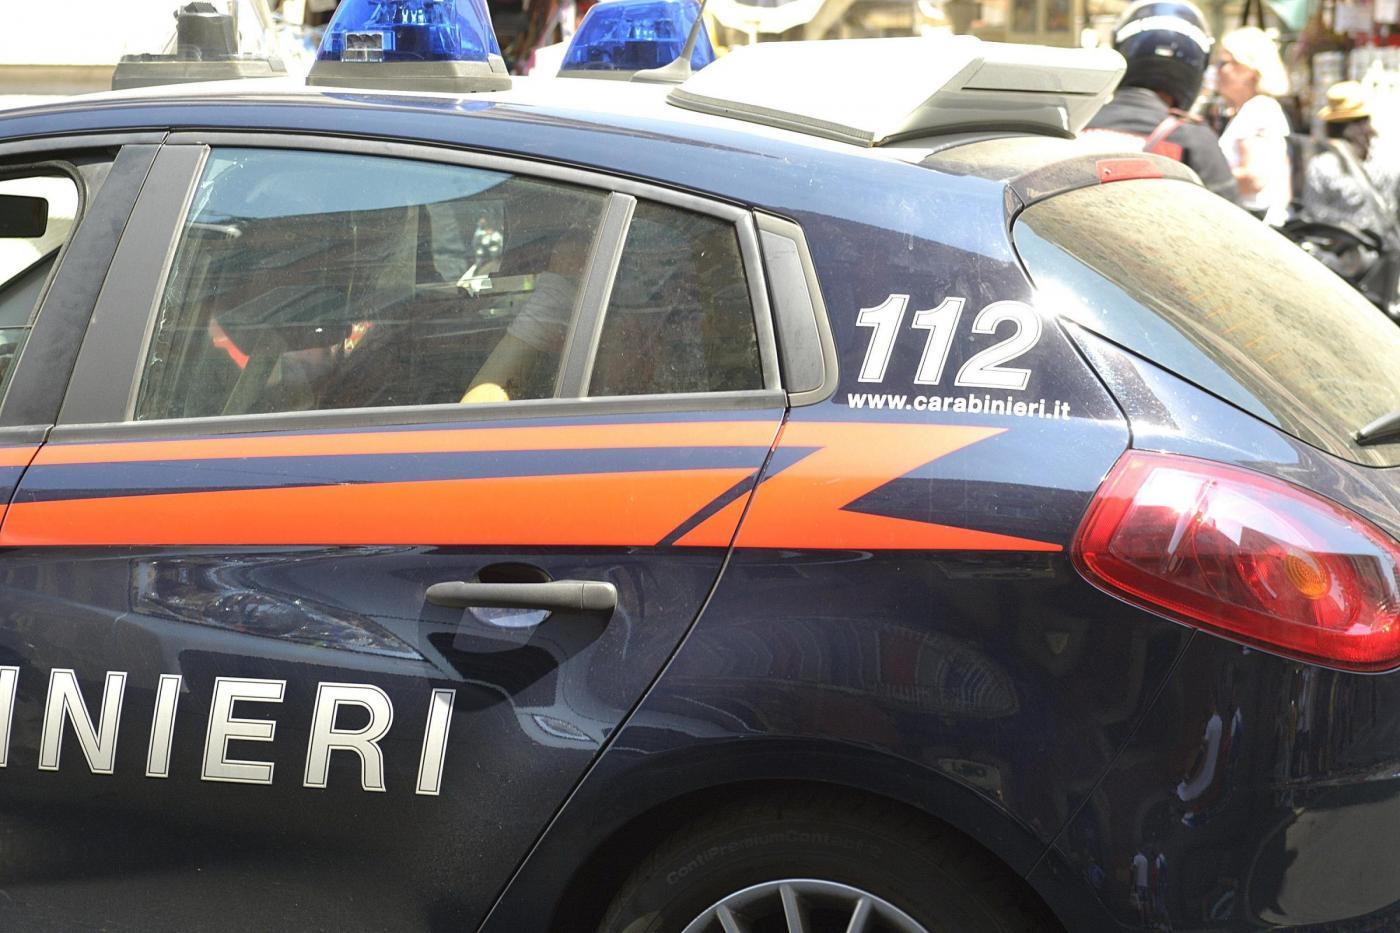 Camorra, a Roma sequestrati beni di 80 milioni di euro